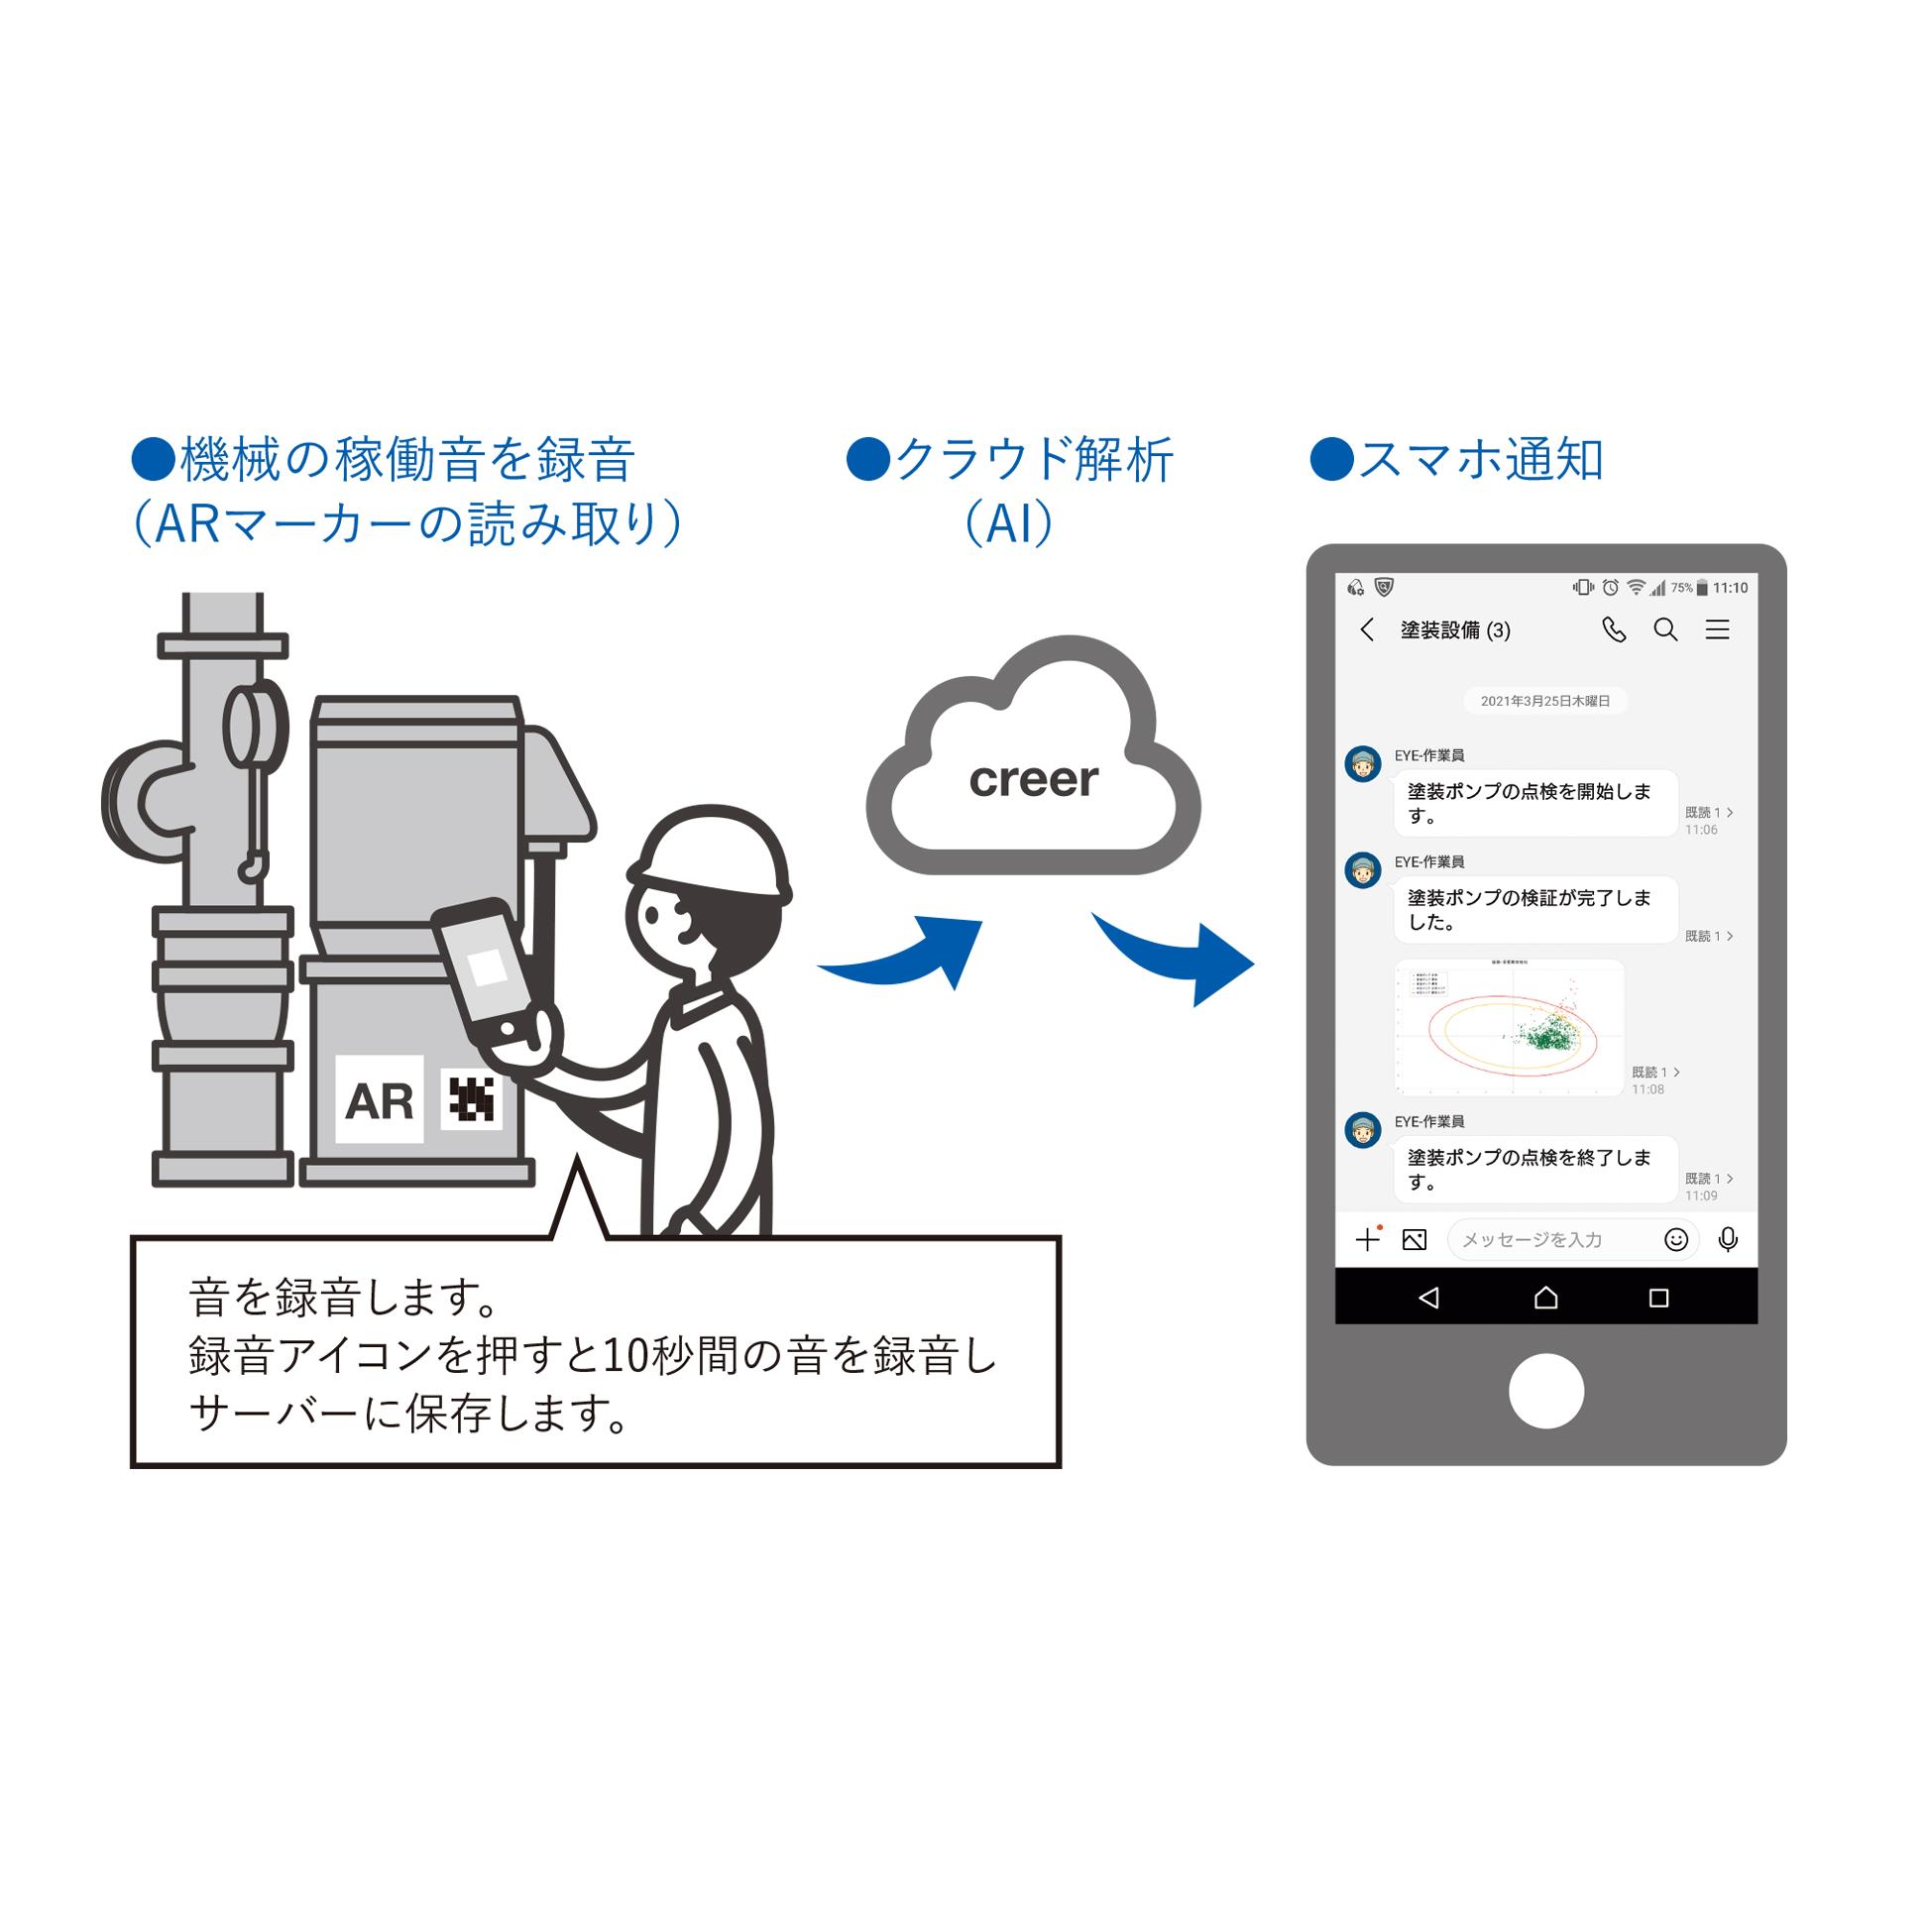 AI、IoTの技術を活用し、工場設備の異常音を検知するアプリを開発。金沢工業大学 松井くにお研究室と株式会社別川製作所の共同研究で